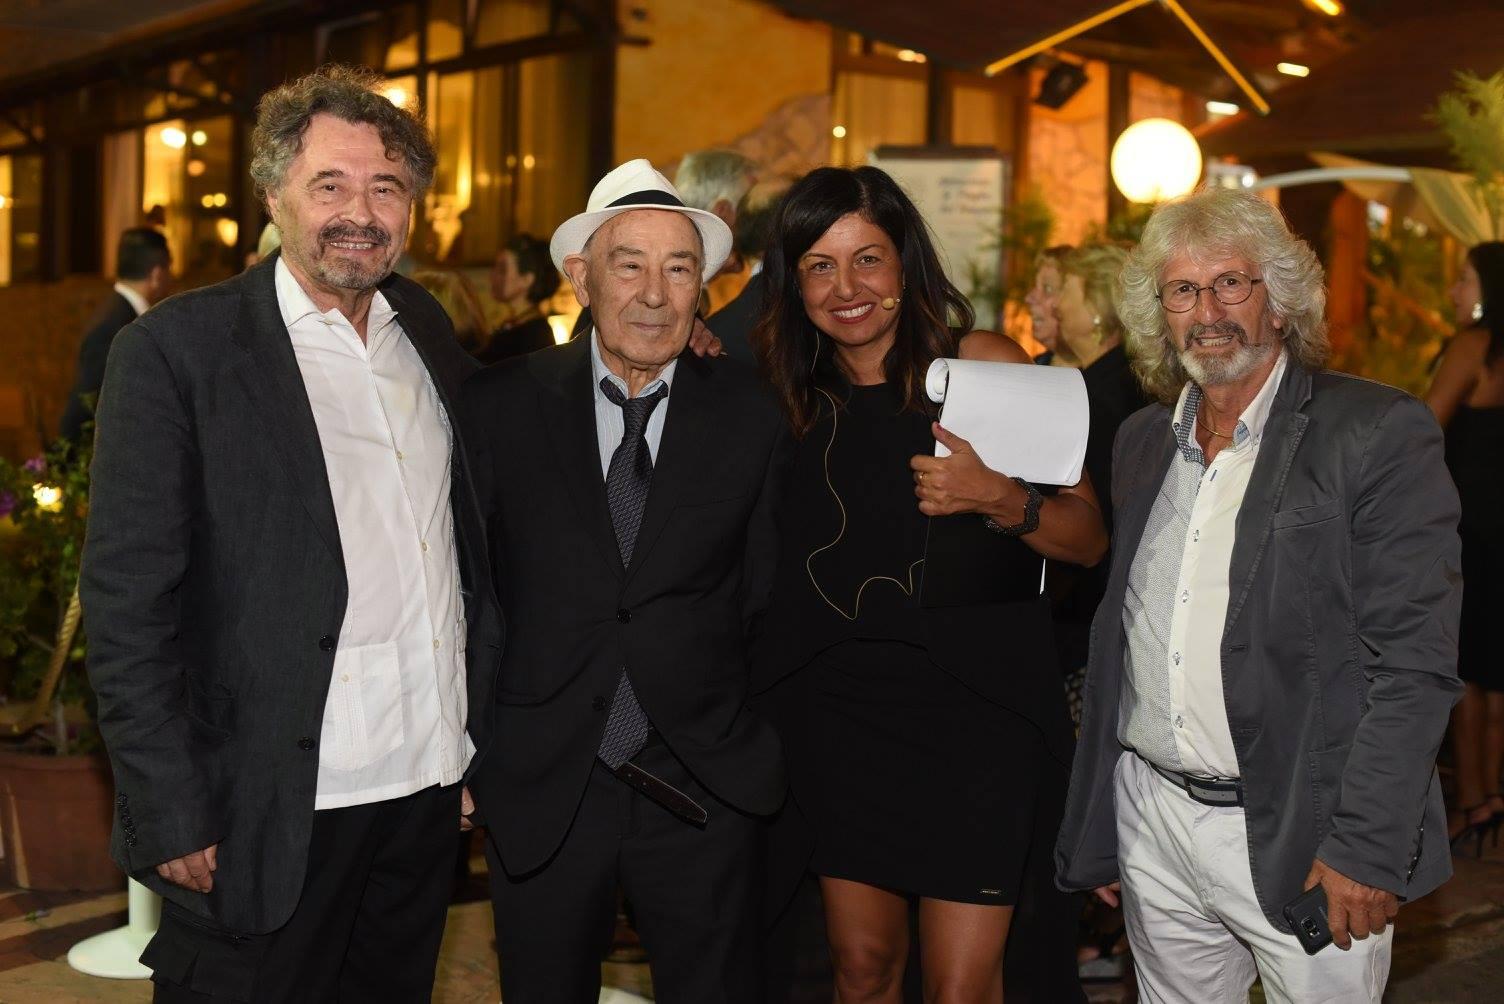 Da sx_Giovanni Brusatori_Carlo Riccardi_Lisa Bernardini_Ignazio Colagrossi